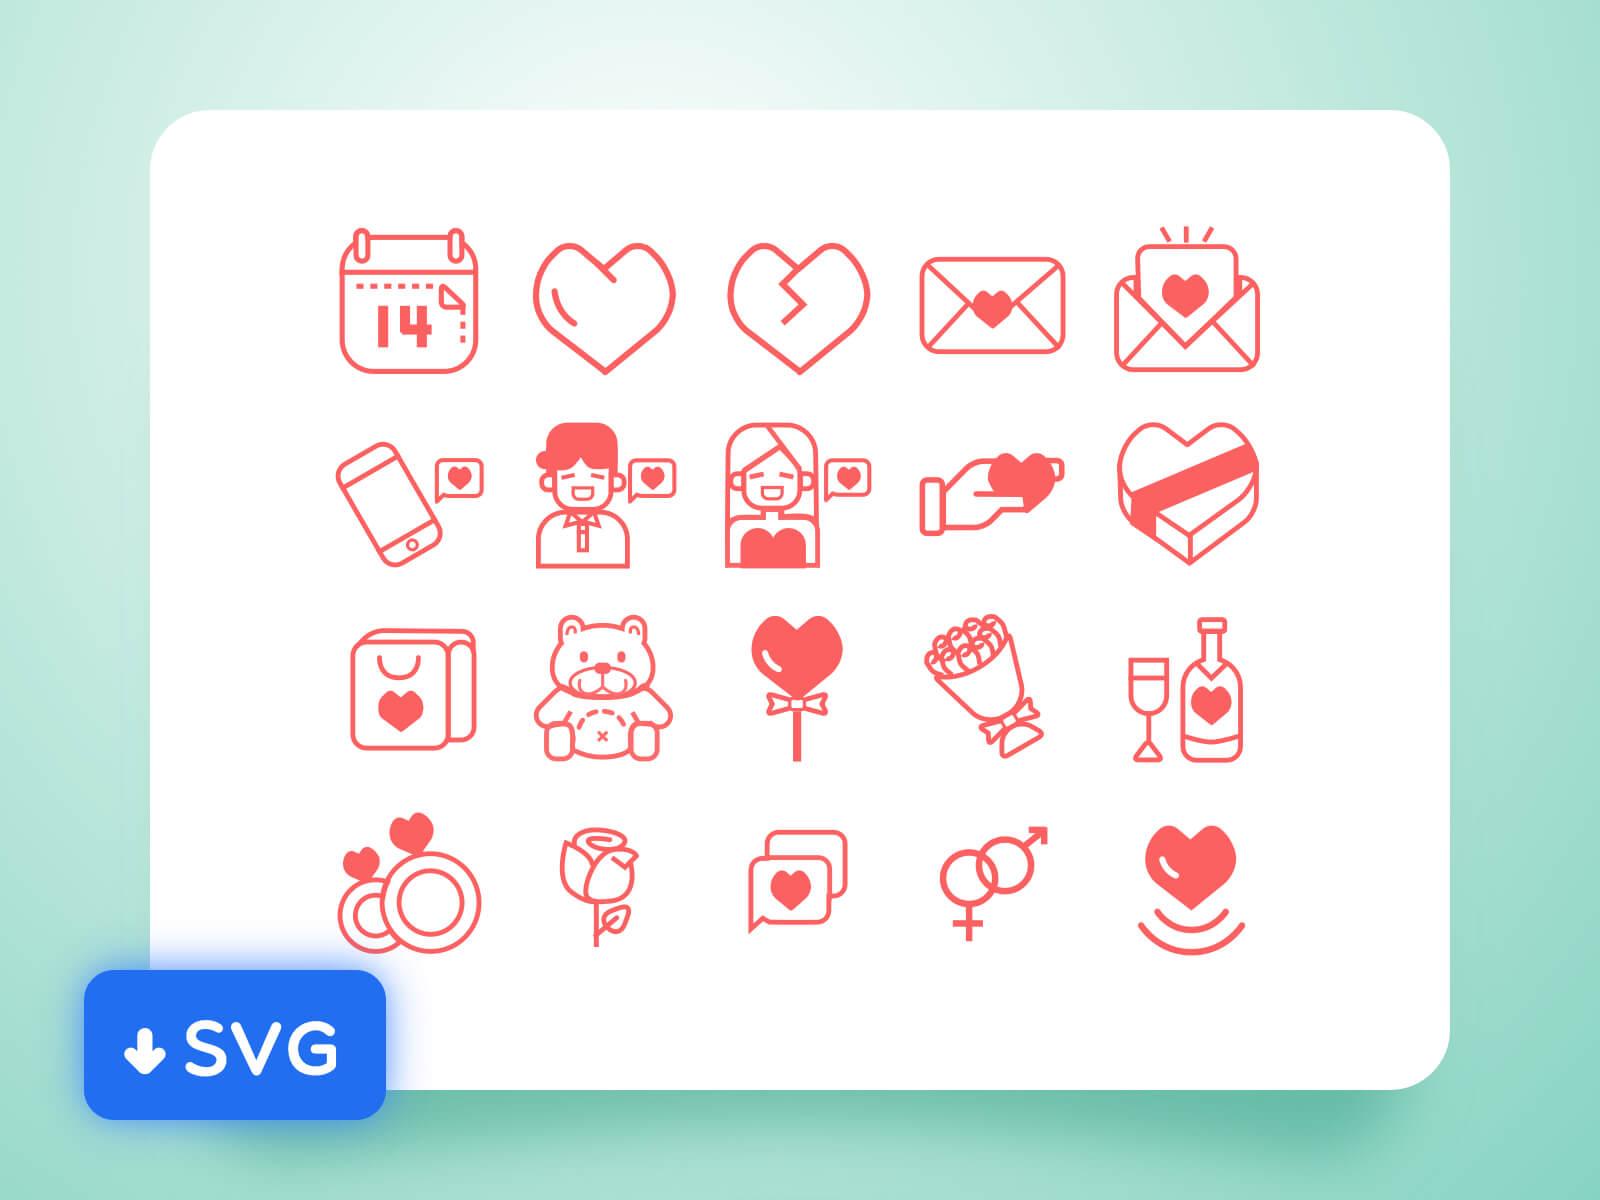 Valentine Day icon cover image